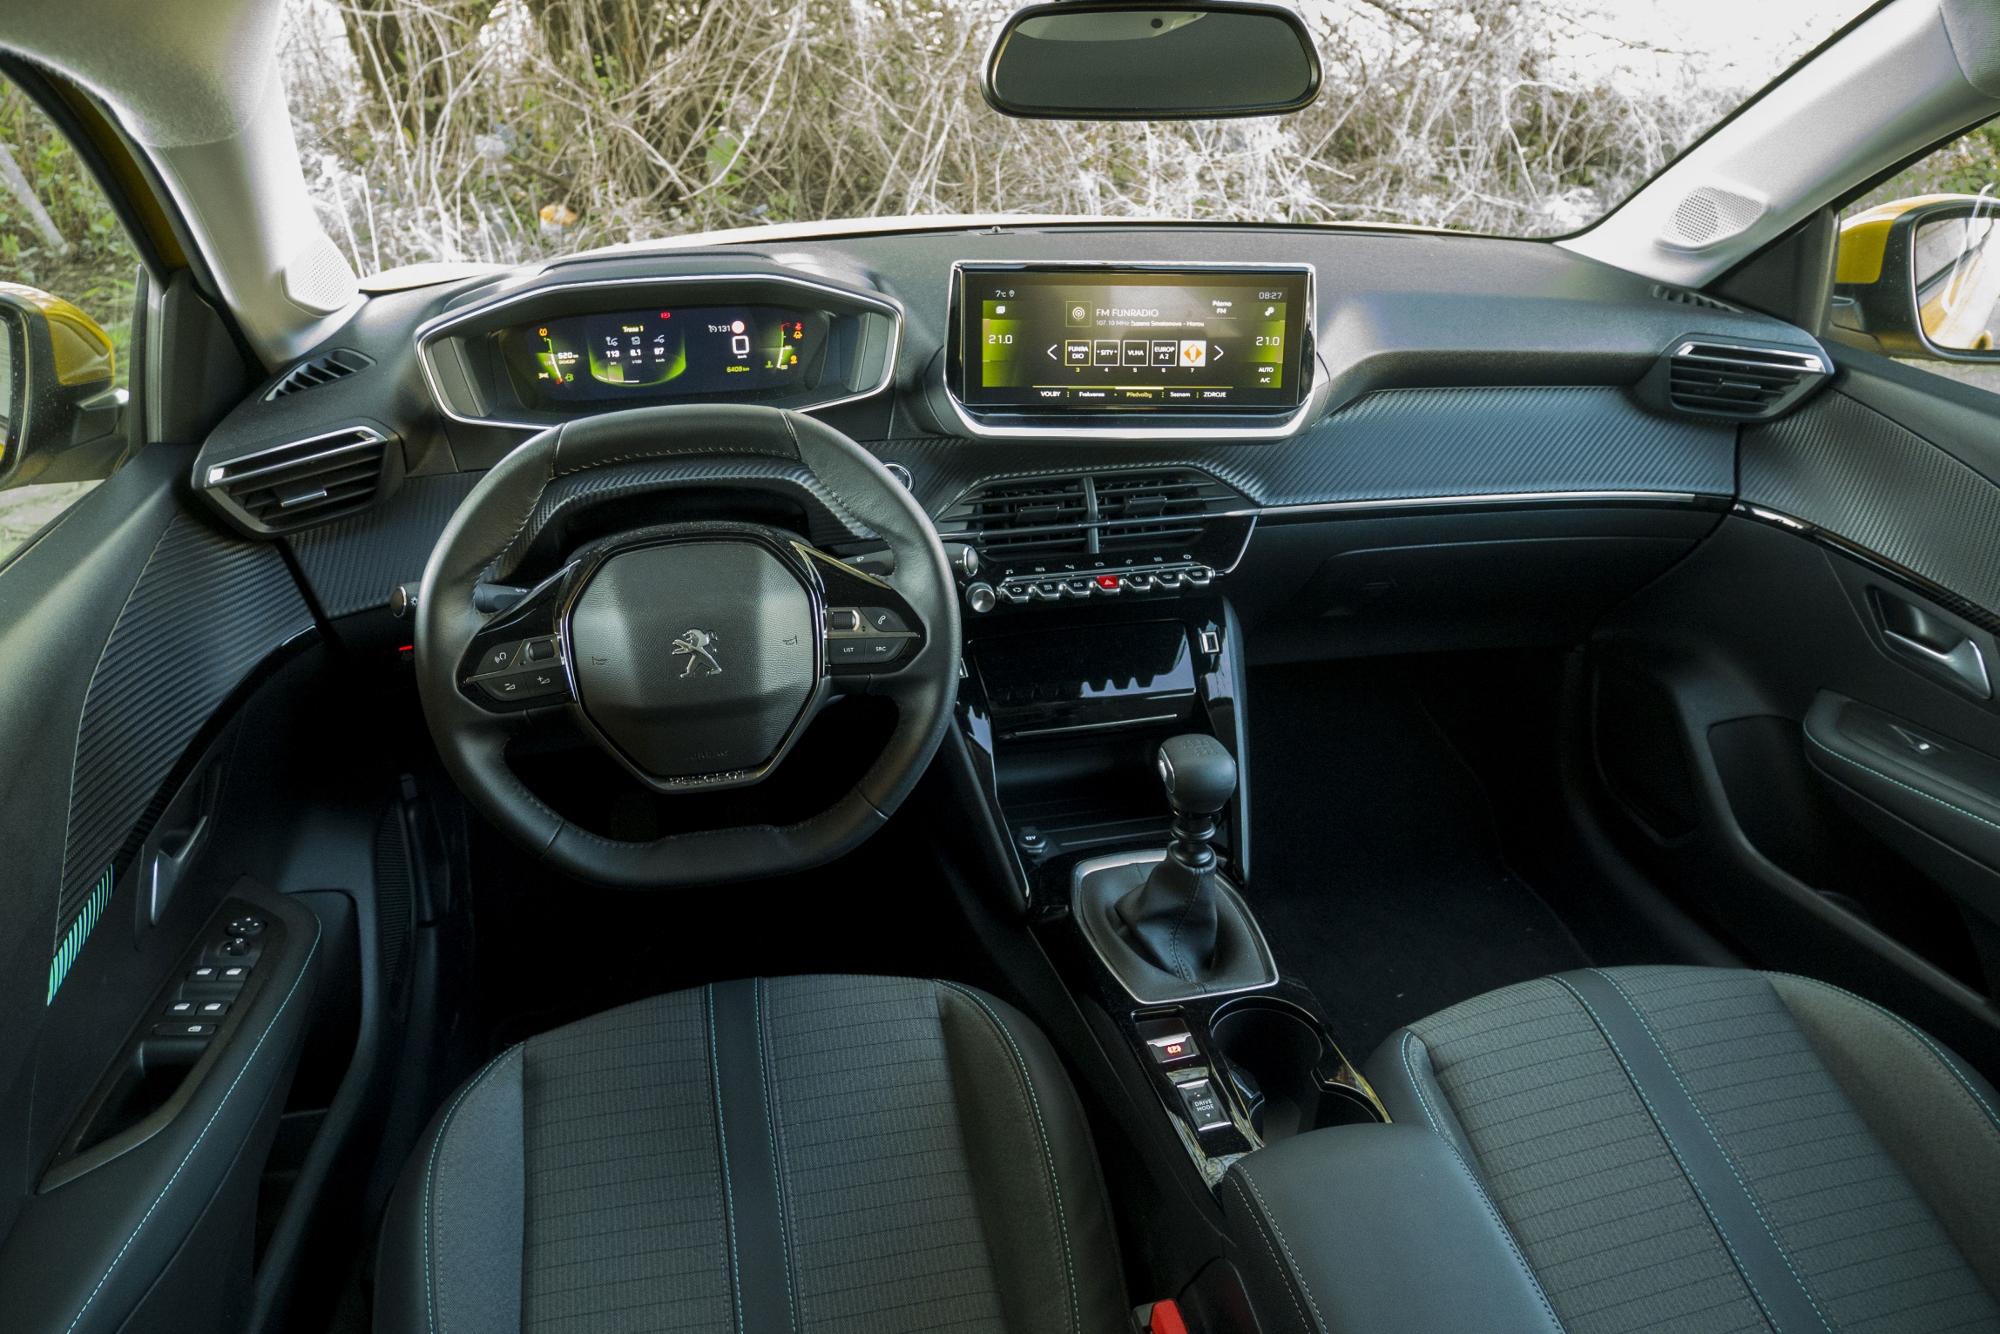 Test: Peugeot 208 prekvapivo pútal pohľady rlrOaUItJZ peugeot-208-36